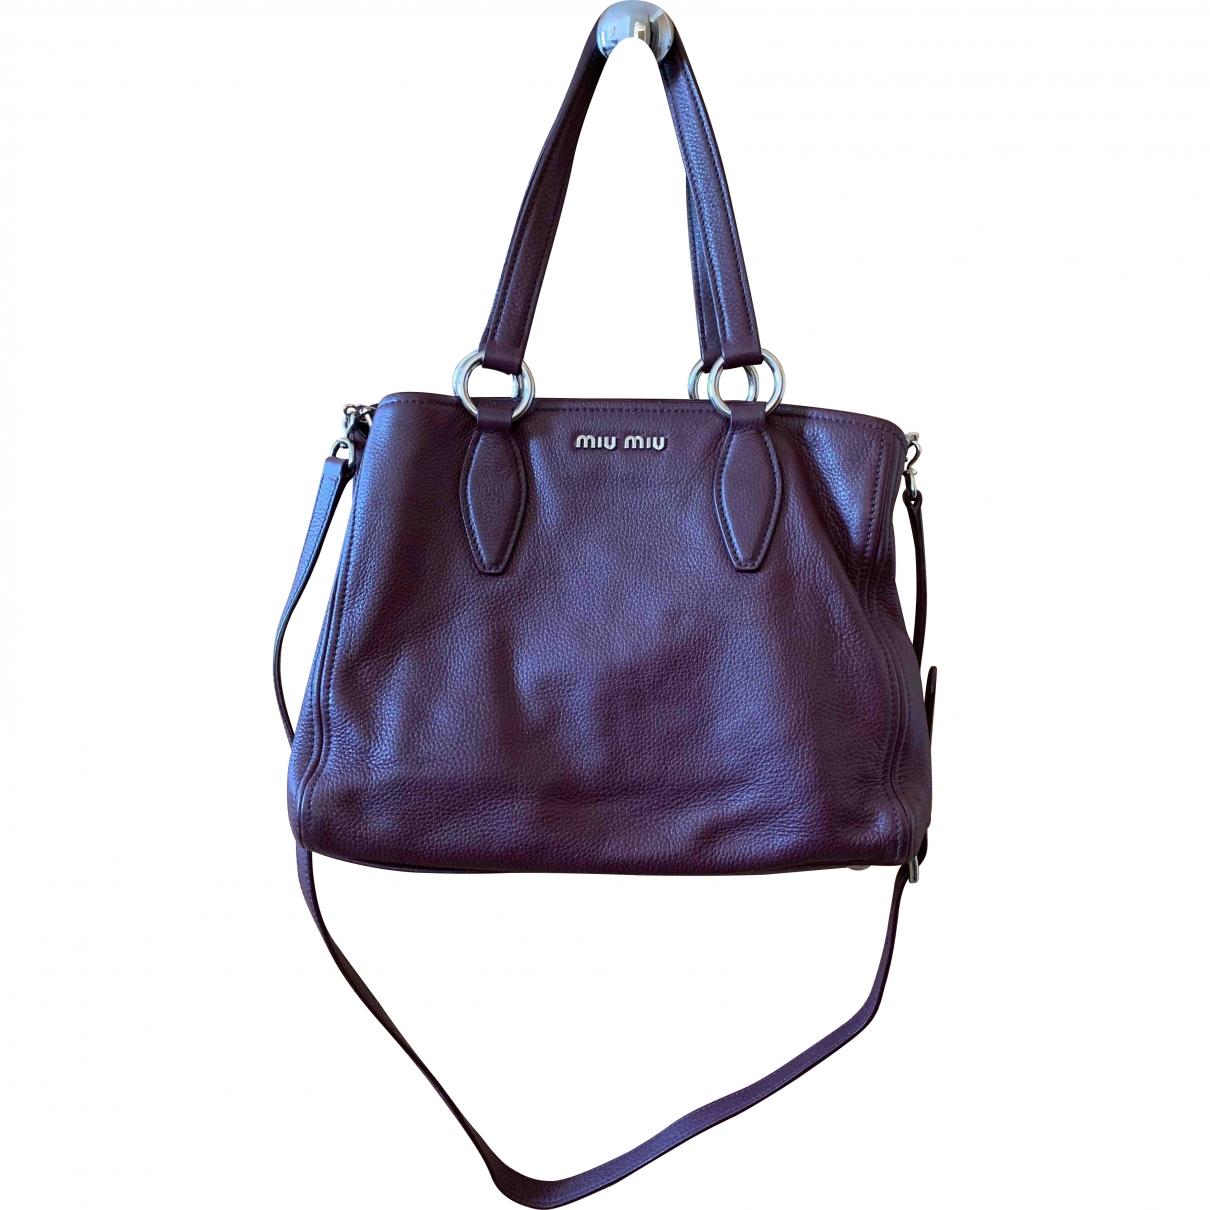 Miu Miu \N Burgundy Leather handbag for Women \N